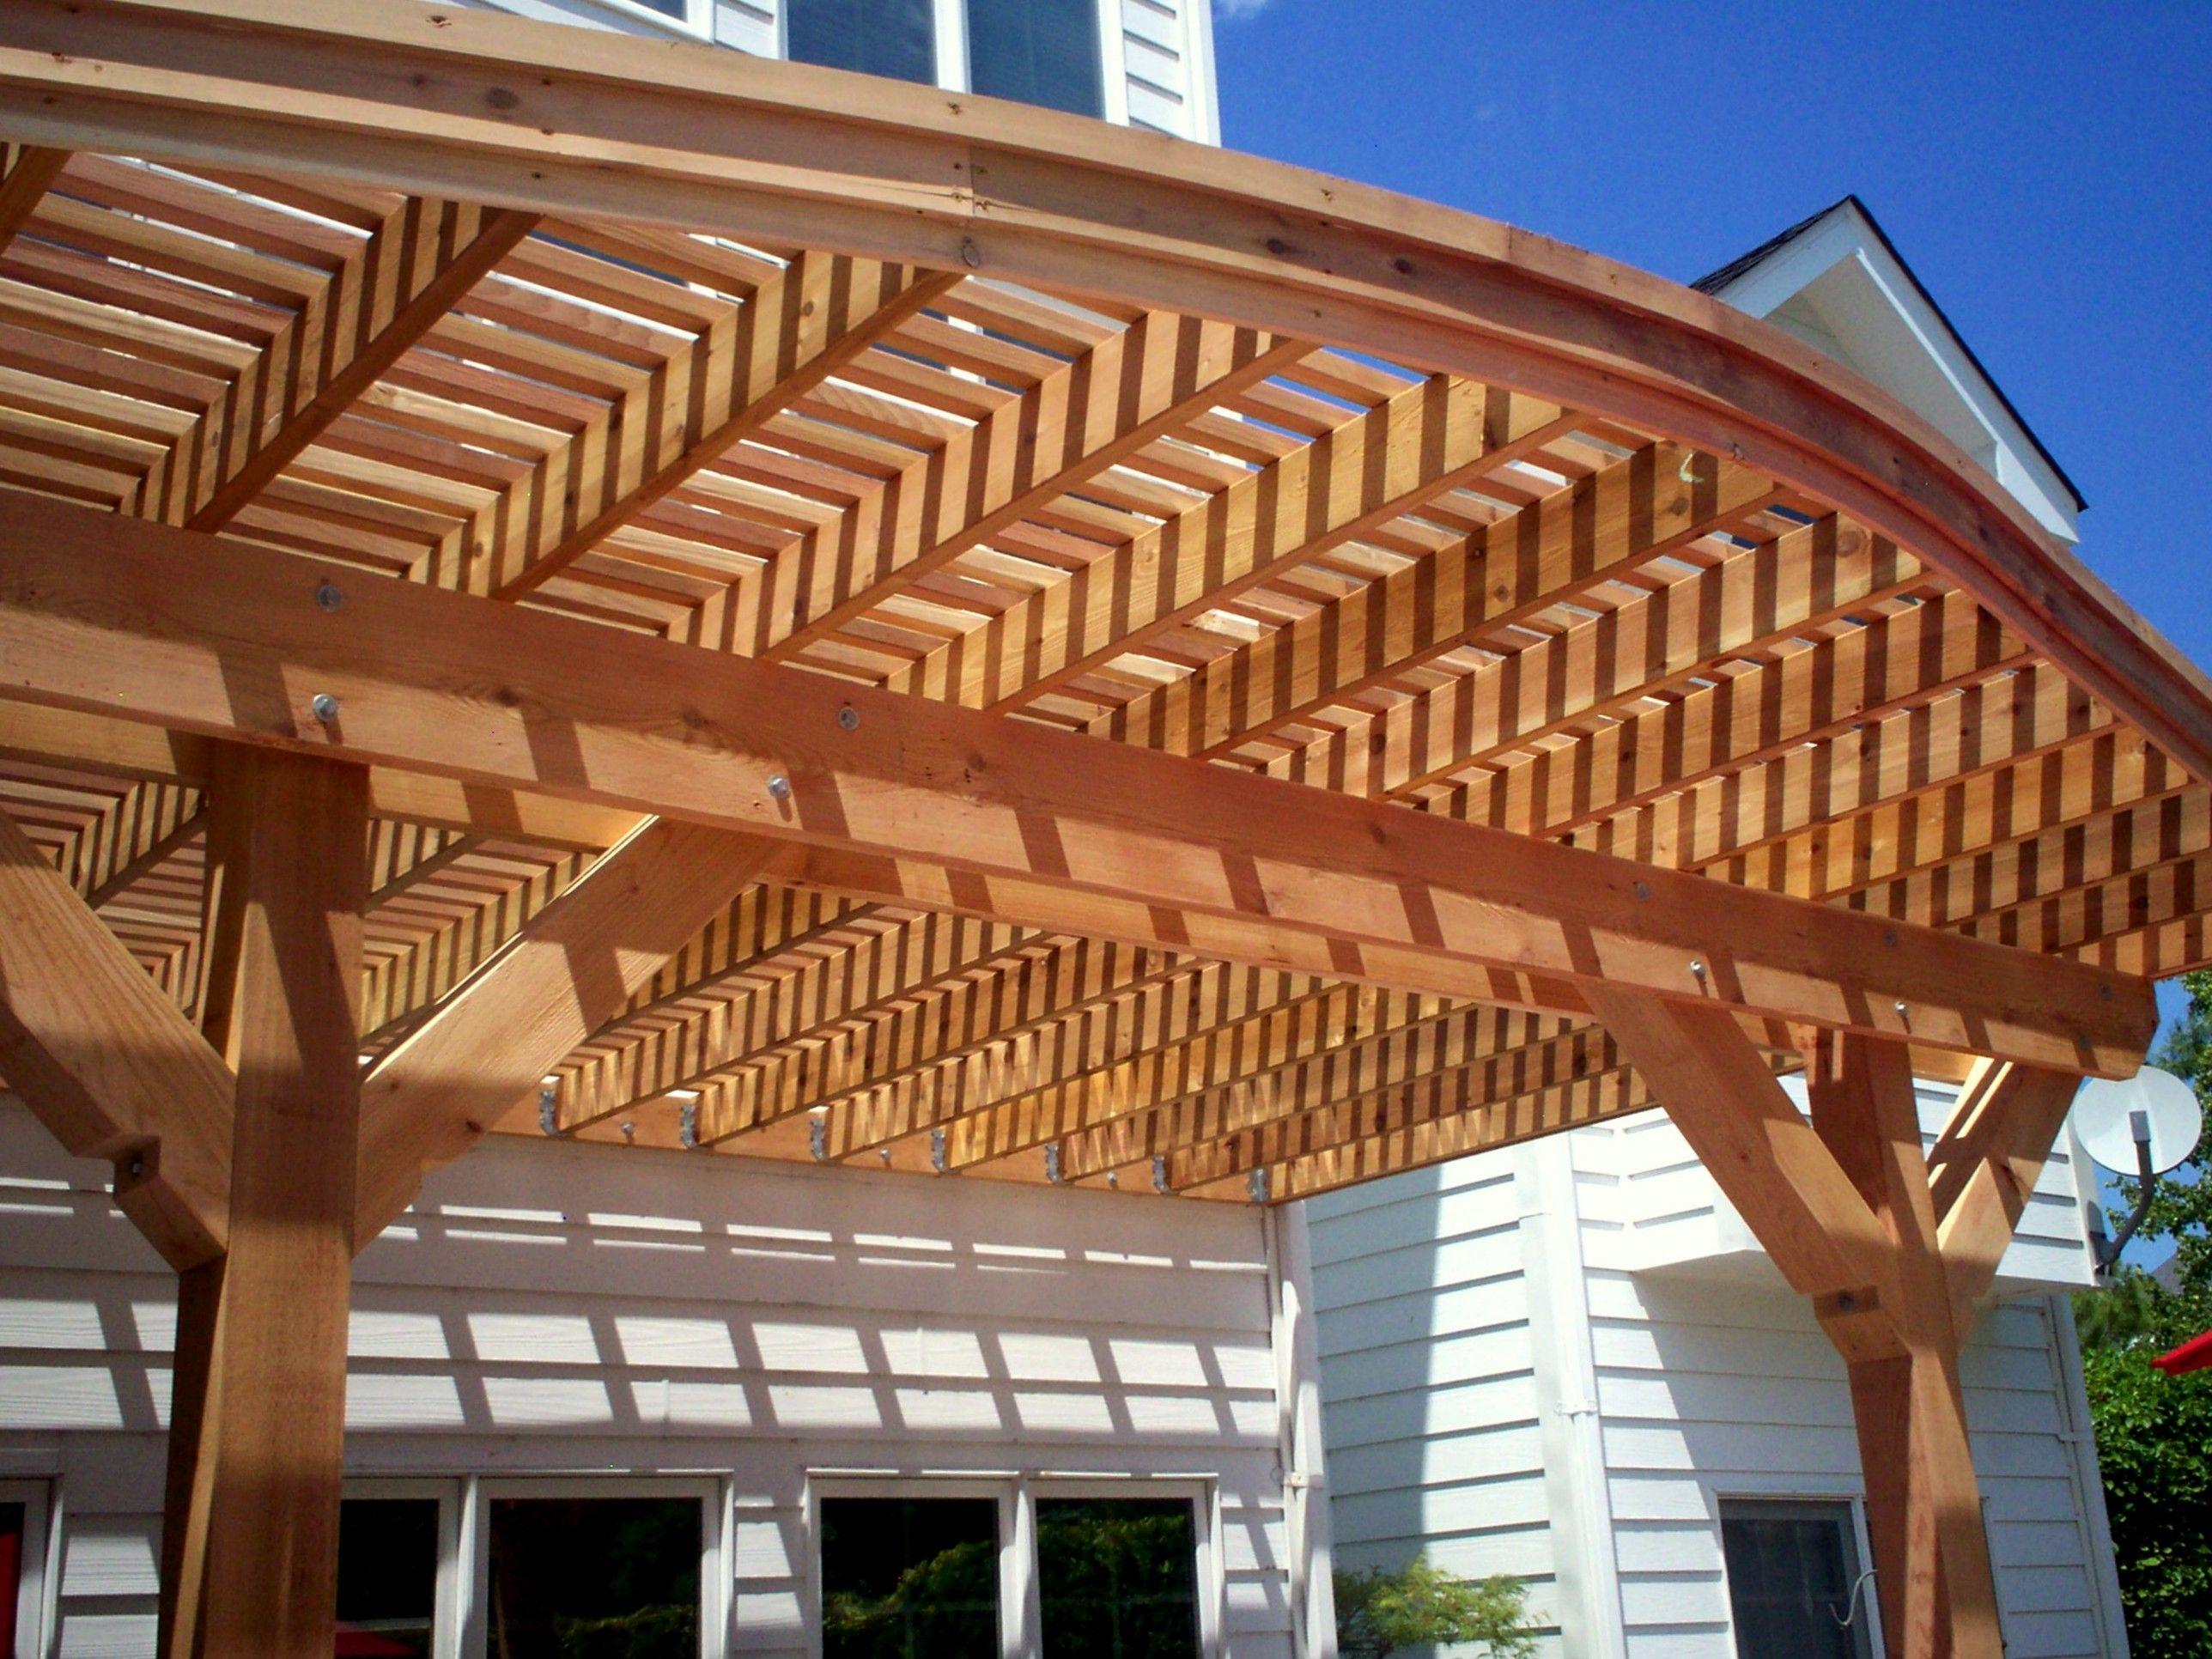 Curved Pergola Plans Pergolas Beams Of Solid Western Red Cedar Rafters Designs By Lawrence Winterburn